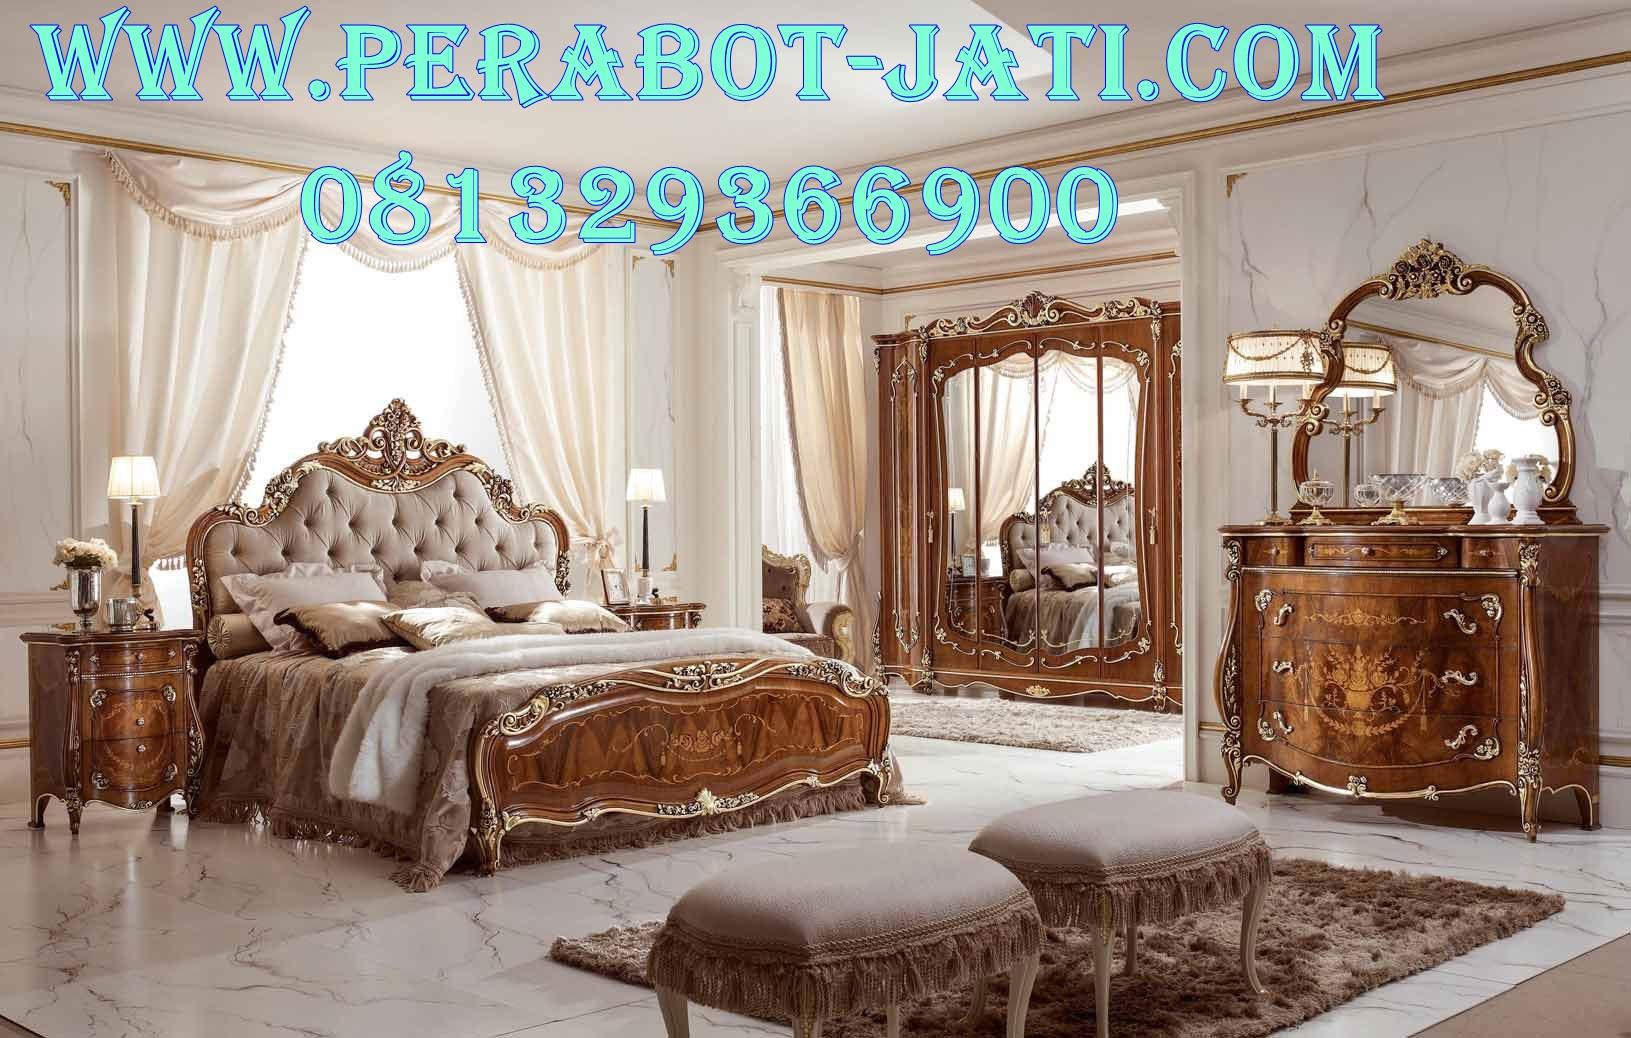 Bed Set Tempat Tidur Jati Mewah Romawi